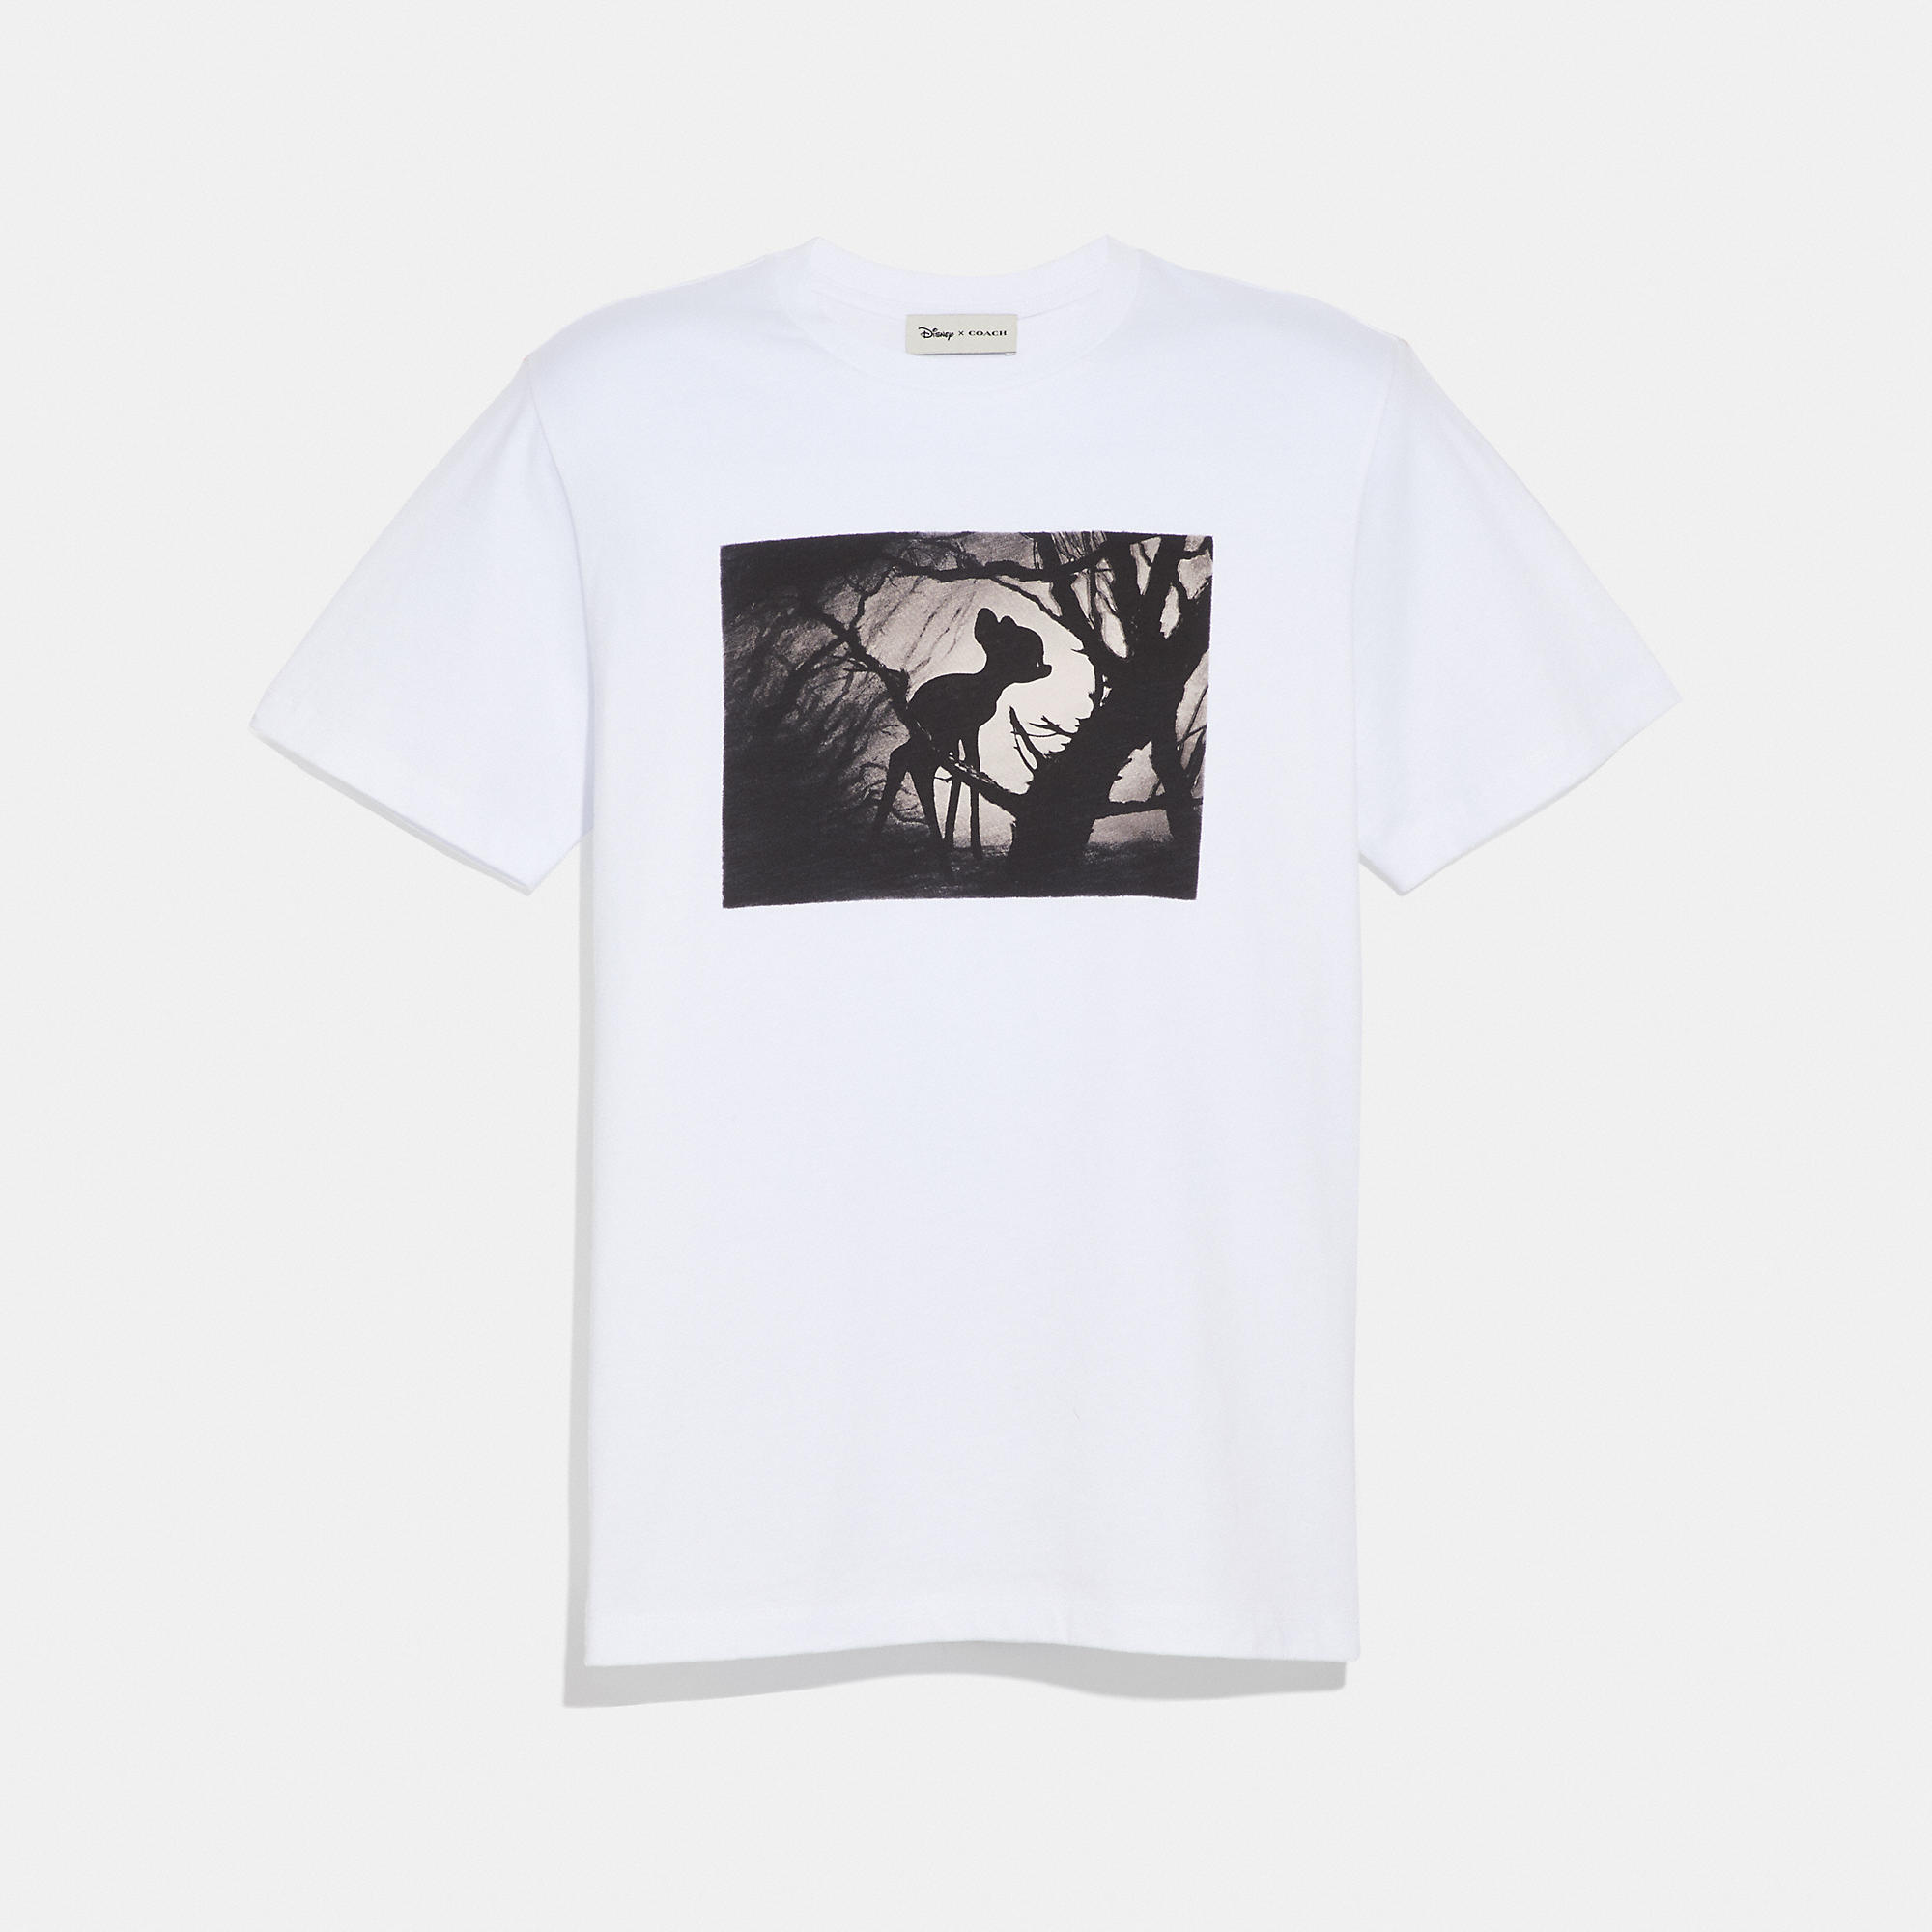 003756fd62f3 Coach Disney X Disney Print T-Shirt - Men's In Optic White With Bambi